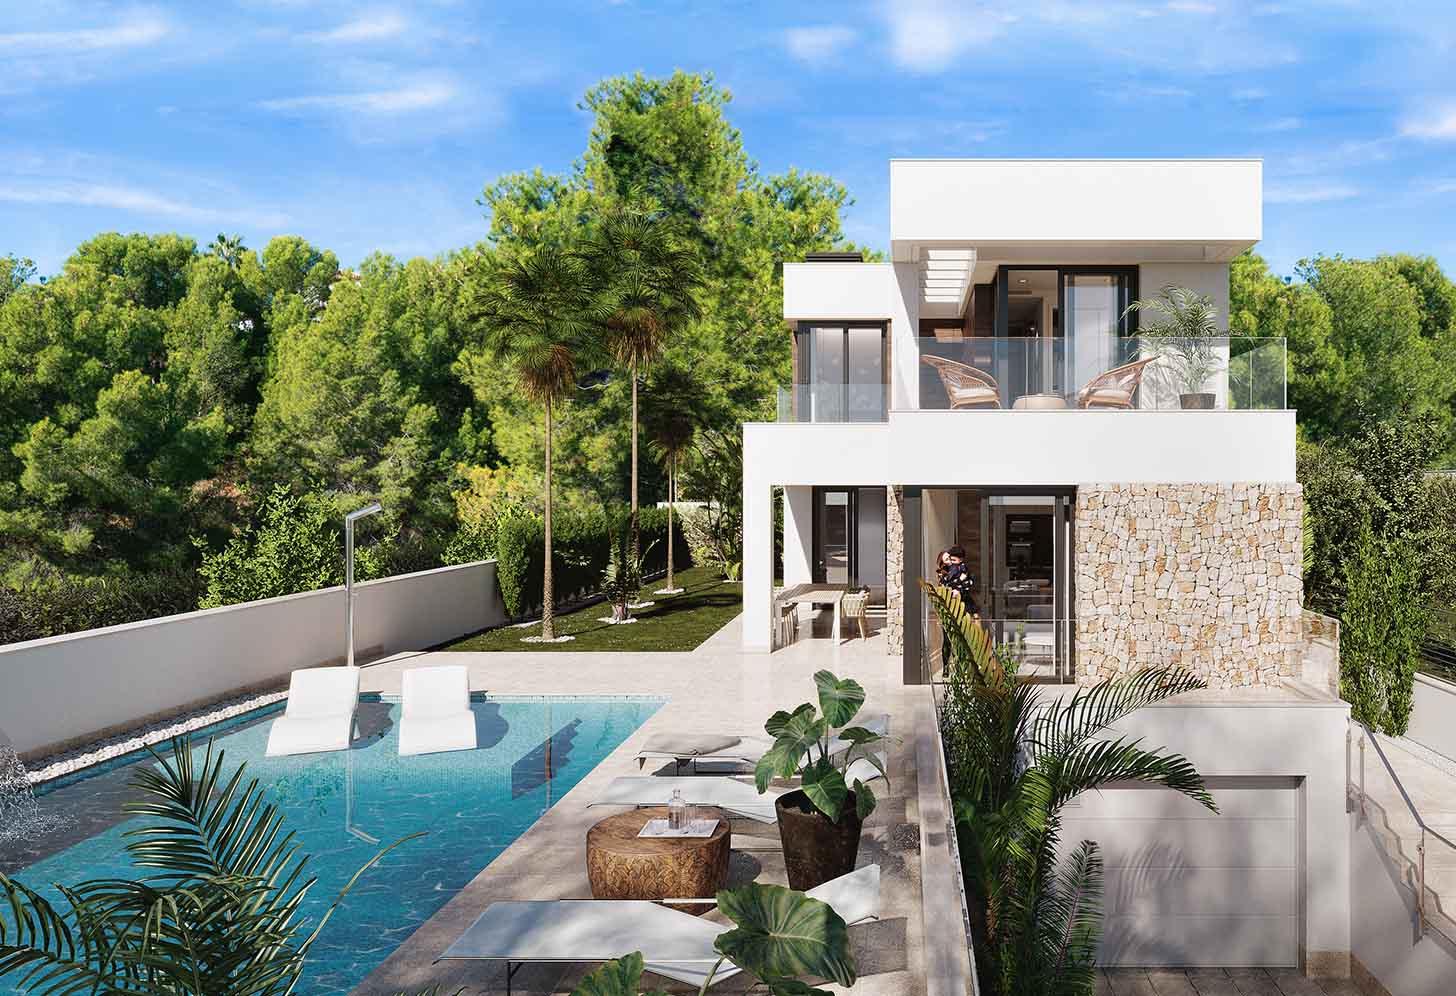 immobilier neuf espagne costa blanca nord finestrat villa piscine